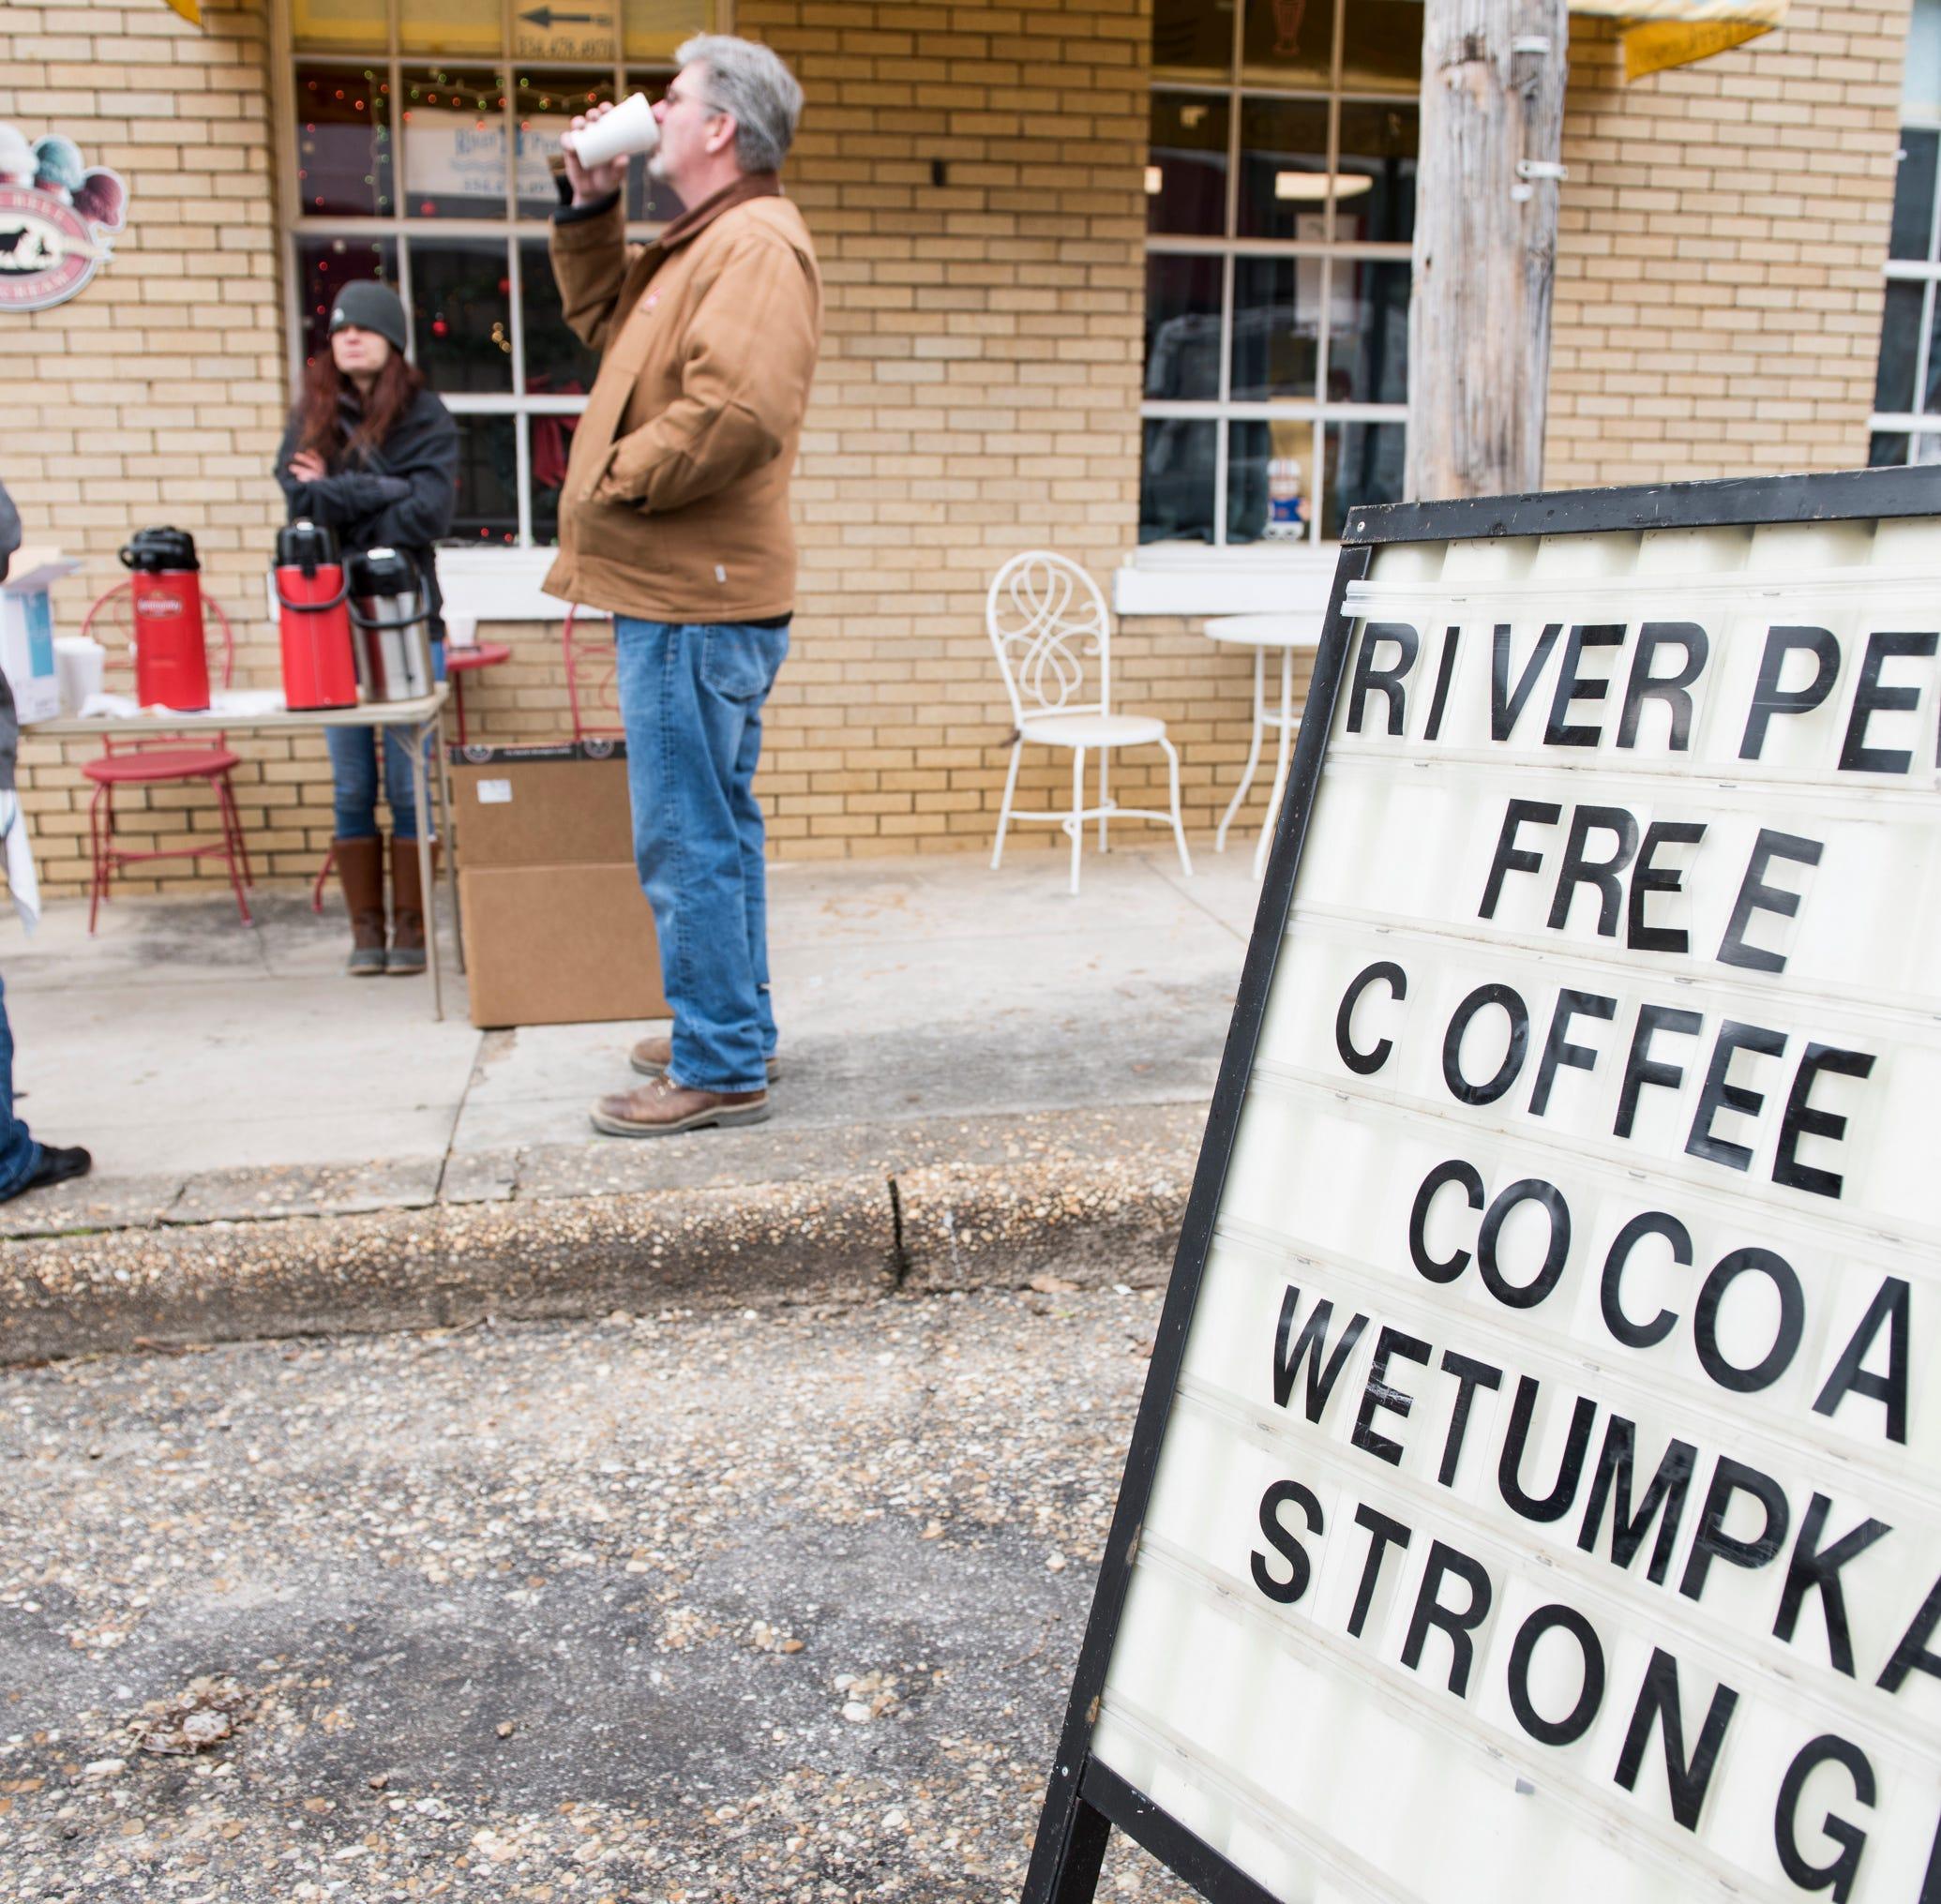 'A town of love': Wetumpka, Alabama, rallies after devastating EF-2 tornado